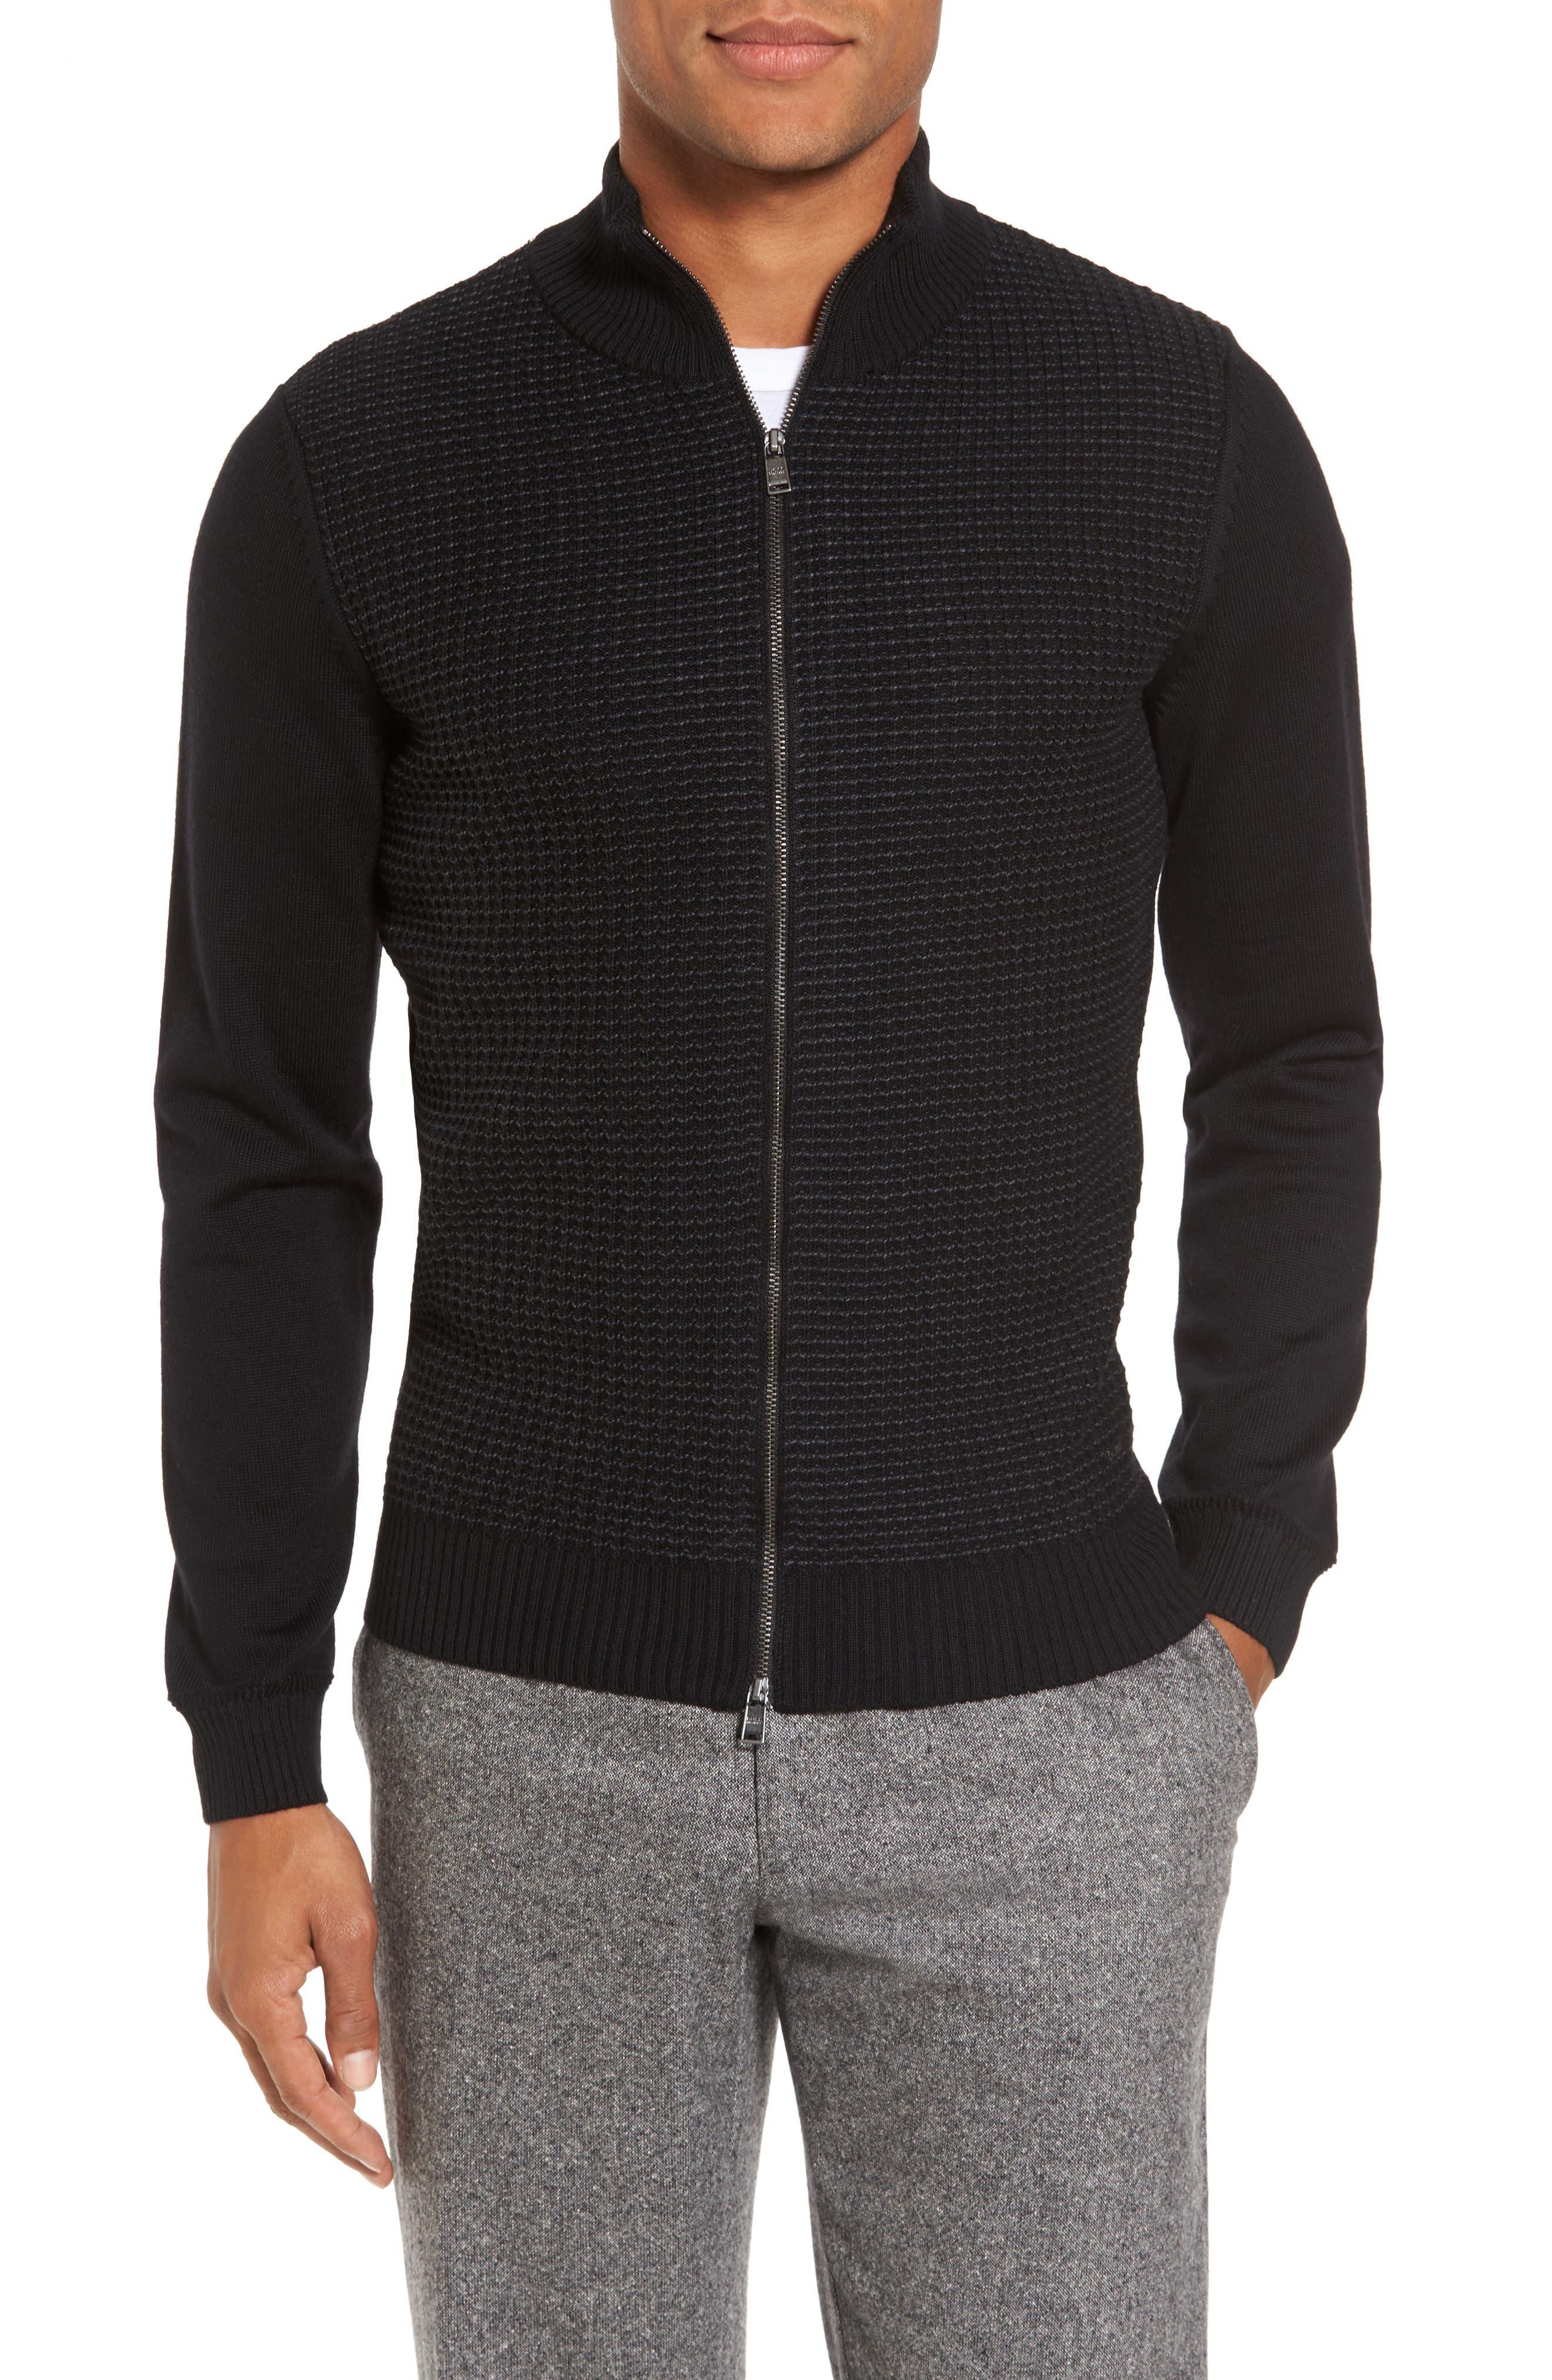 Alternate Image 1 Selected - BOSS Bacco Full Zip Wool Sweater Jacket